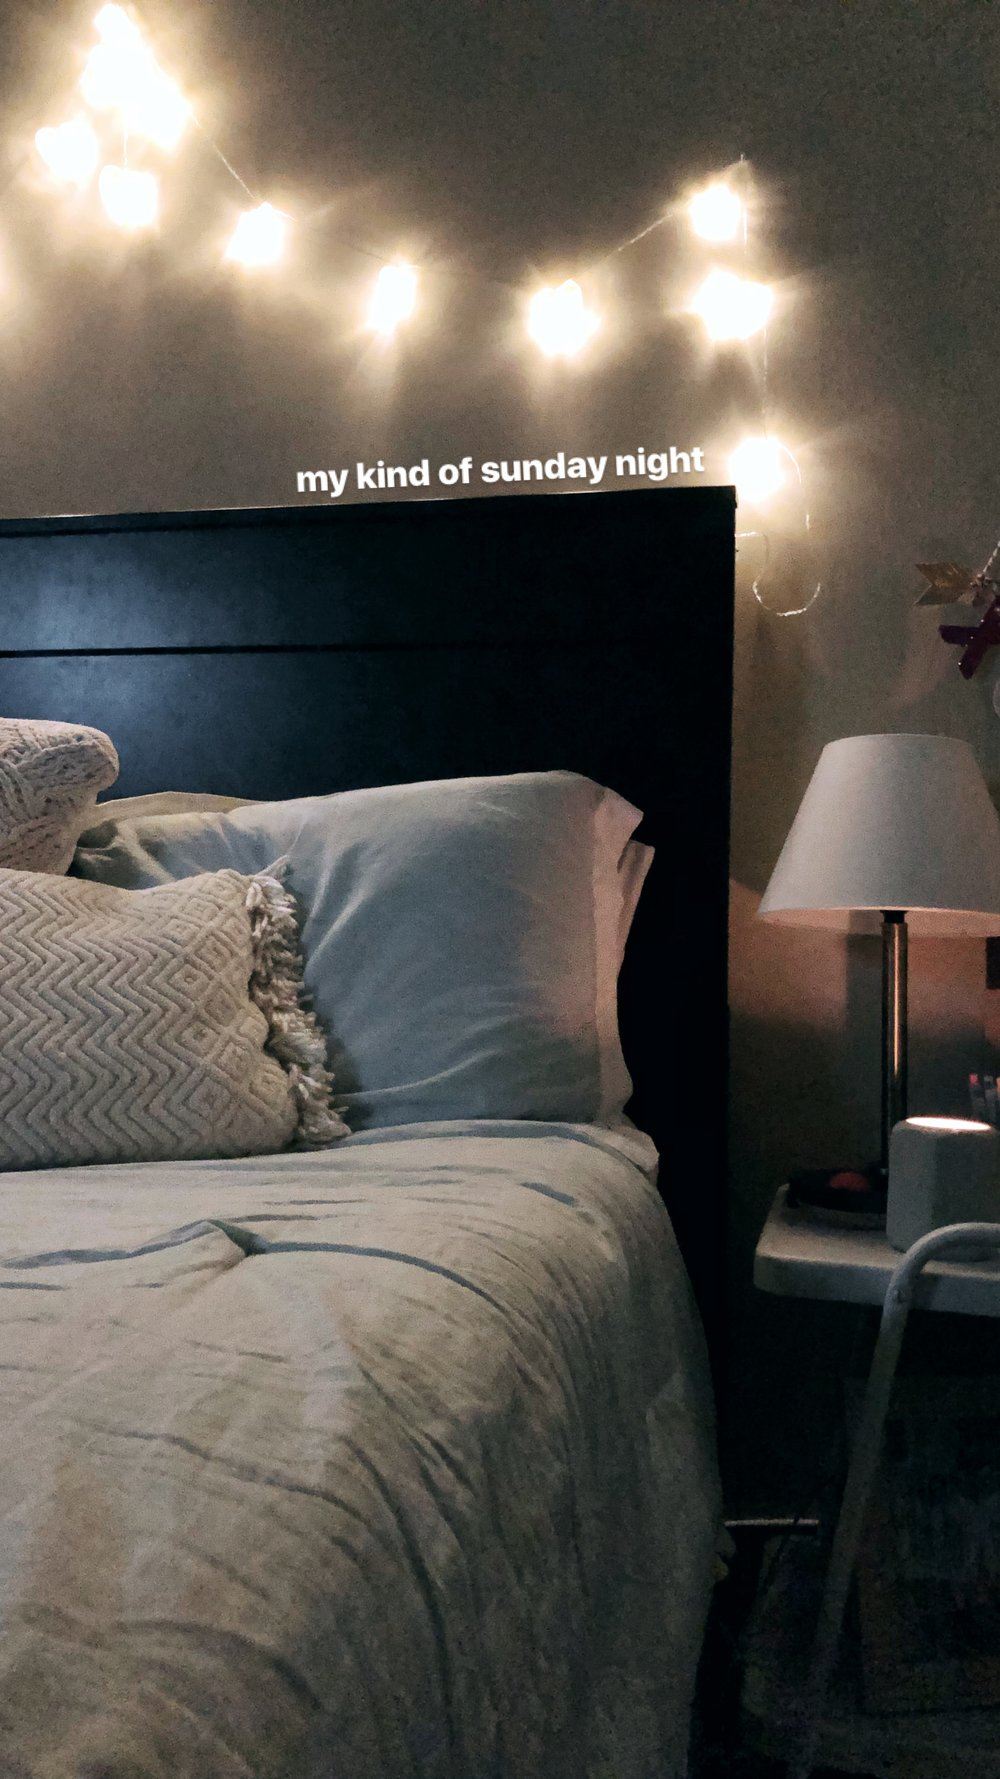 Dreamy, cozy, Sunday nights